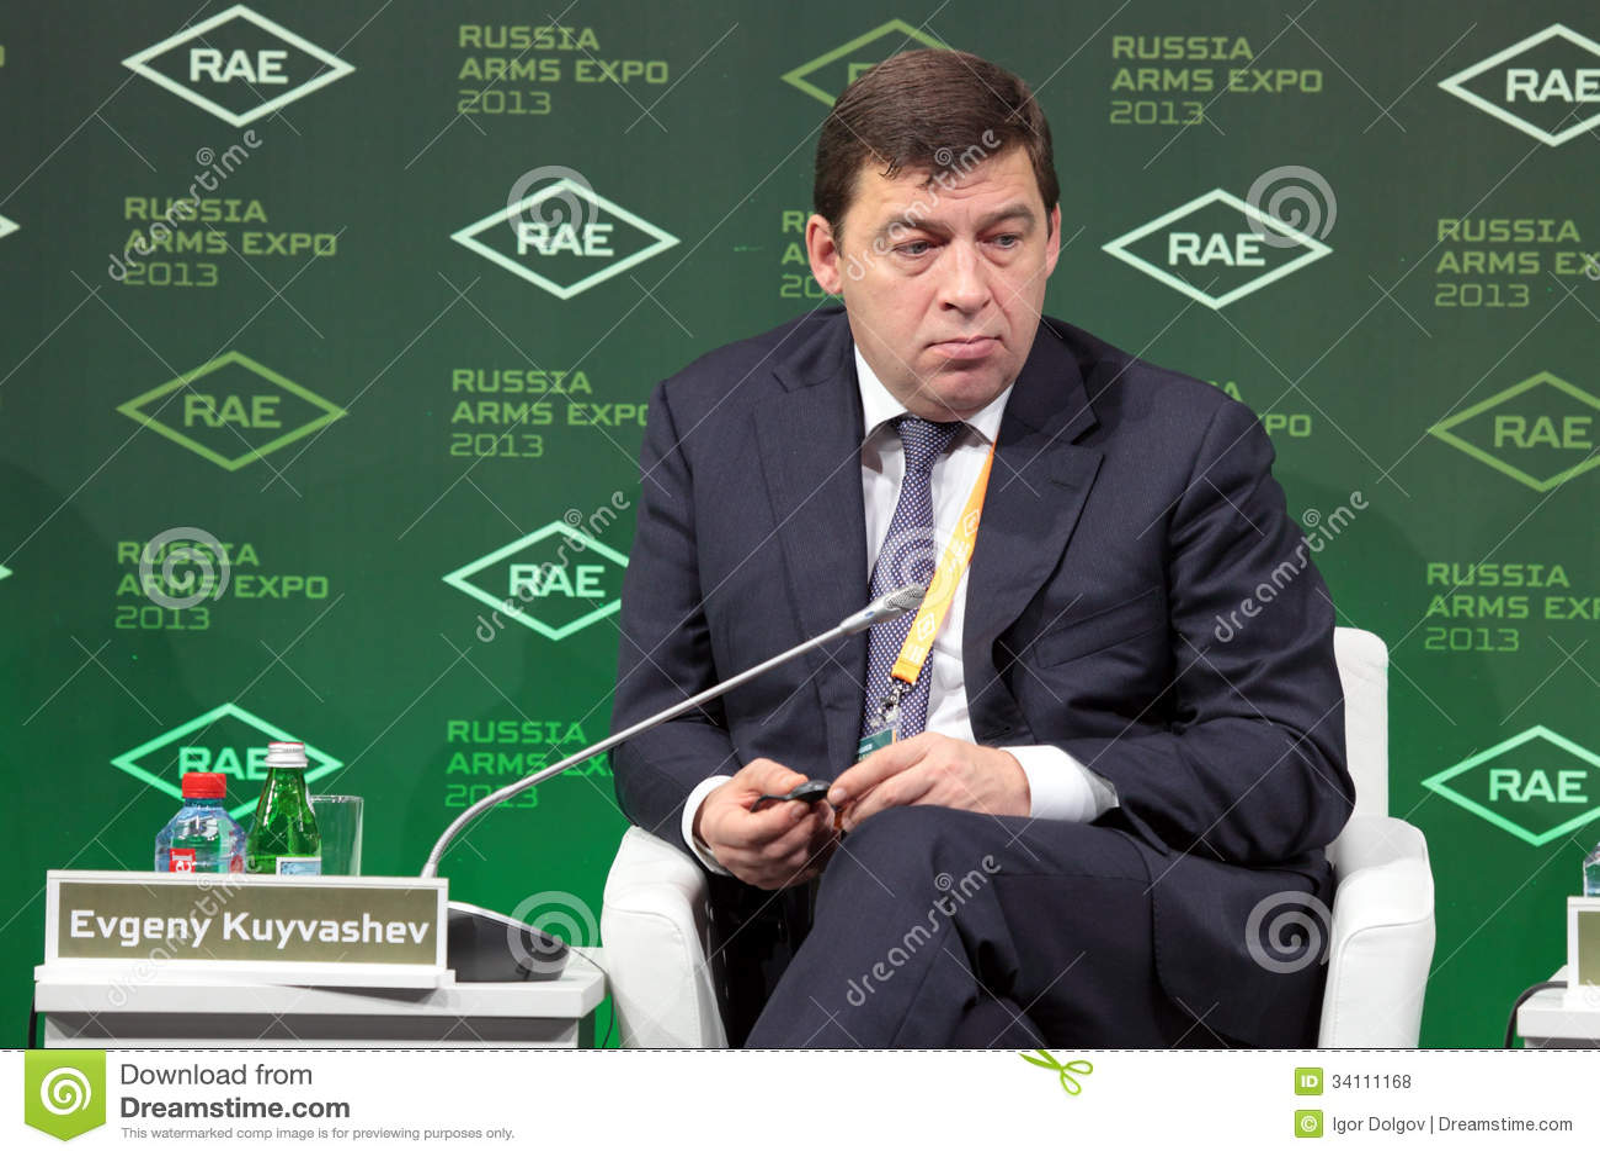 Evgeny Kuyvashev Editorial Stock Photo - Image: 34111168